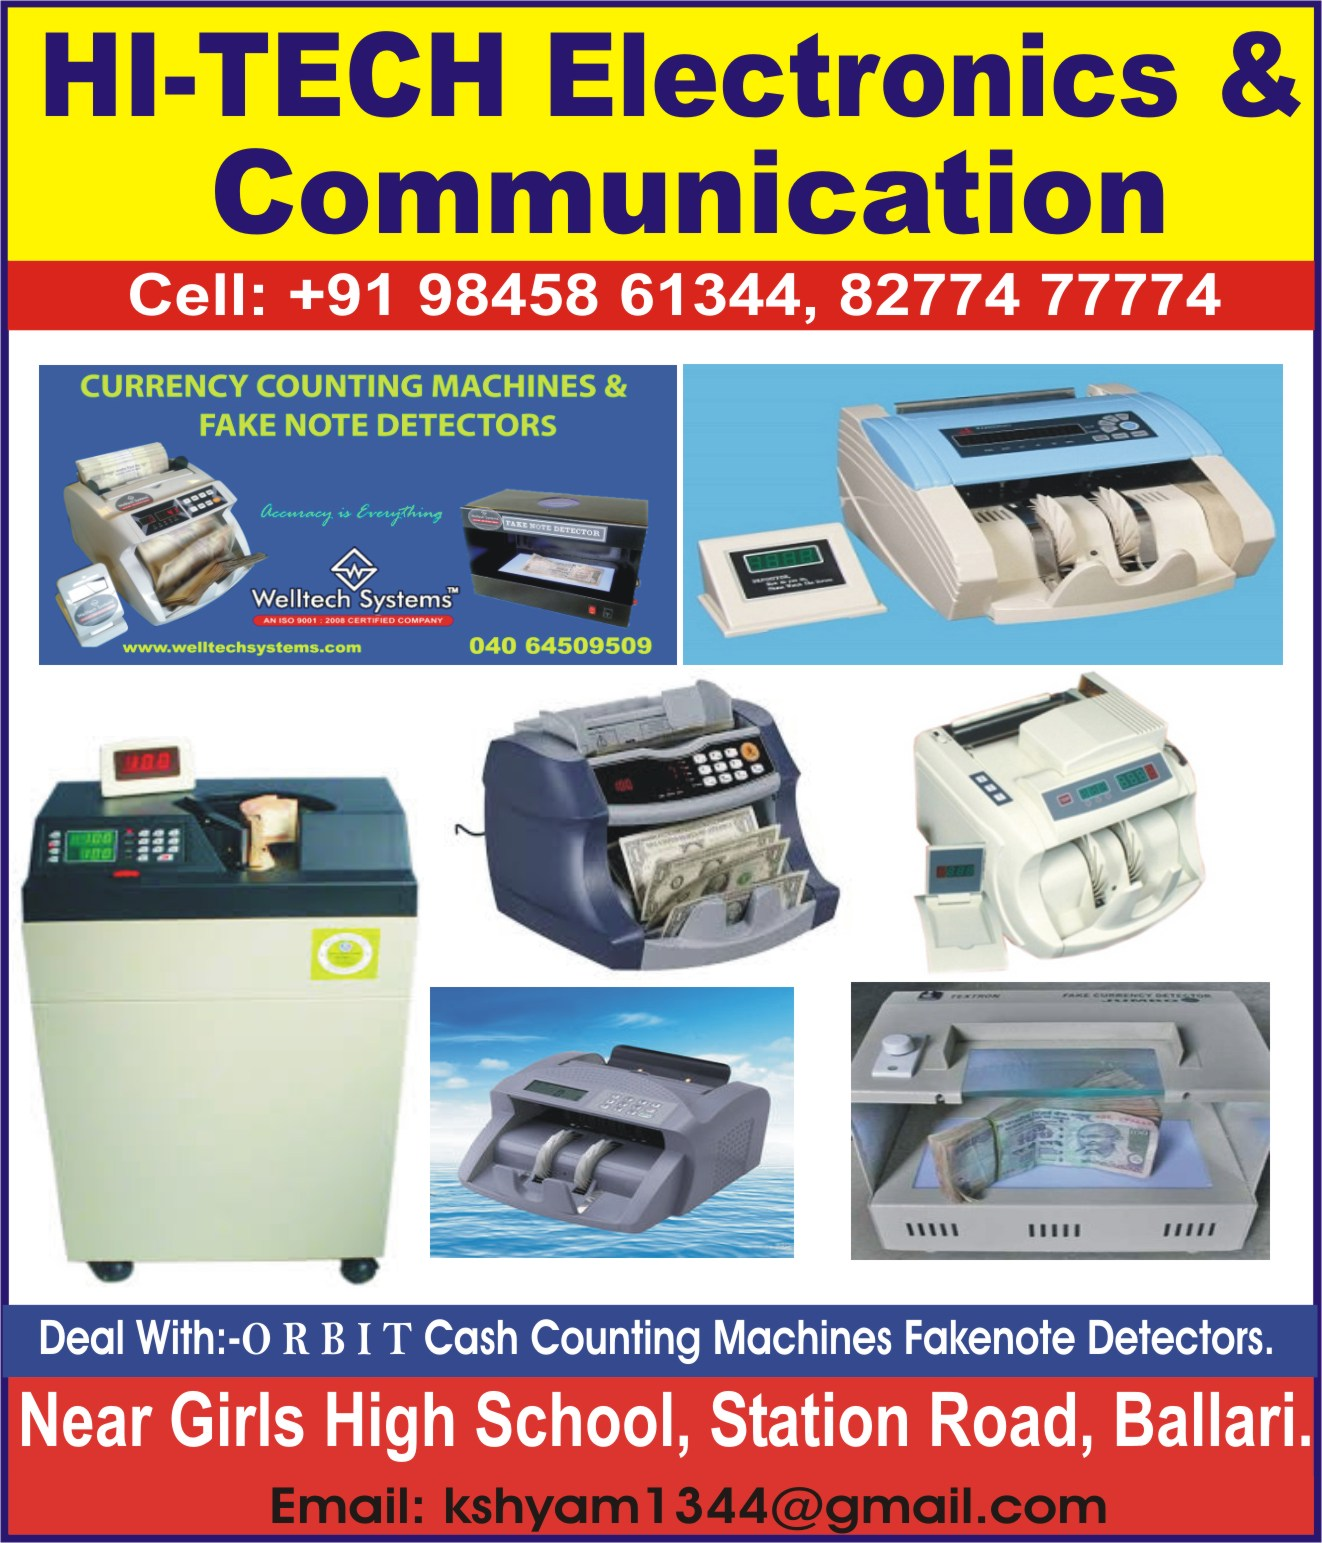 Hi-Tech Electronics & Communication